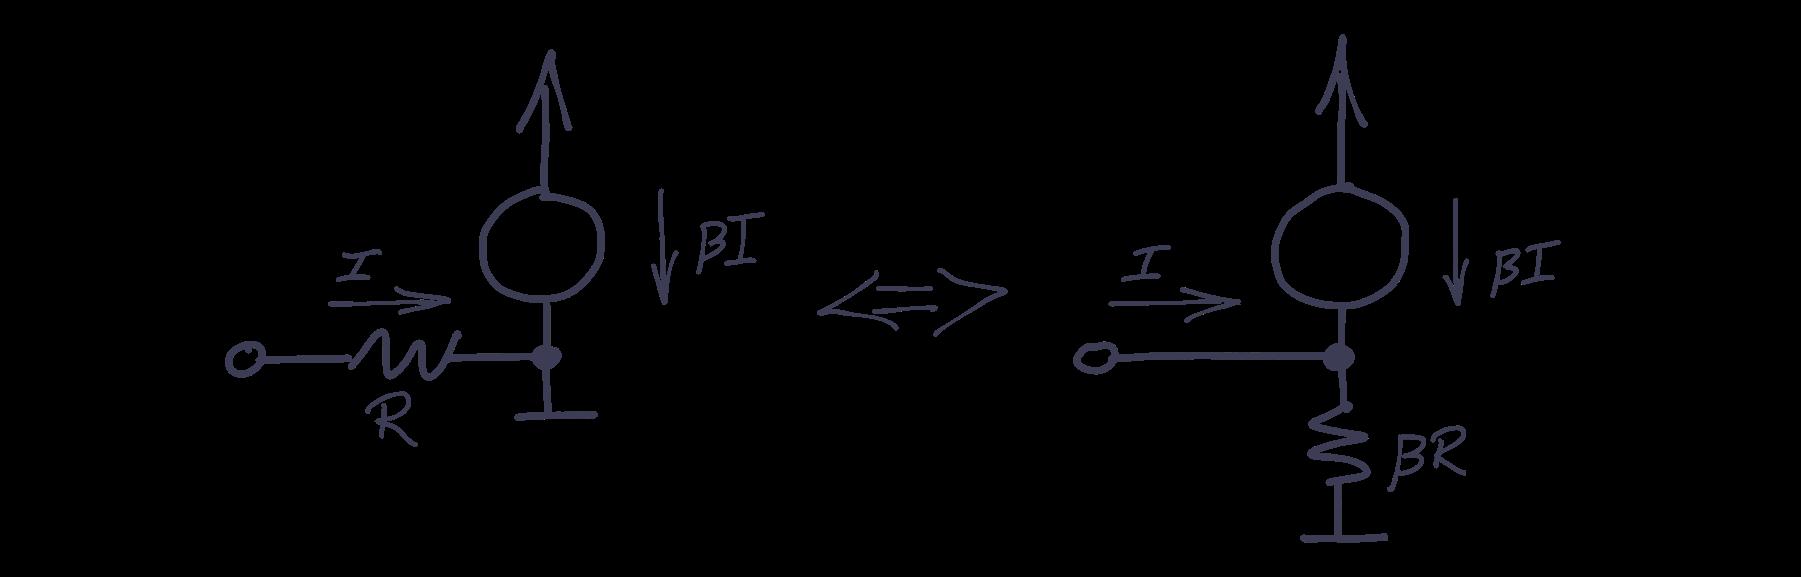 components_bjt-t-diagrams-01.png